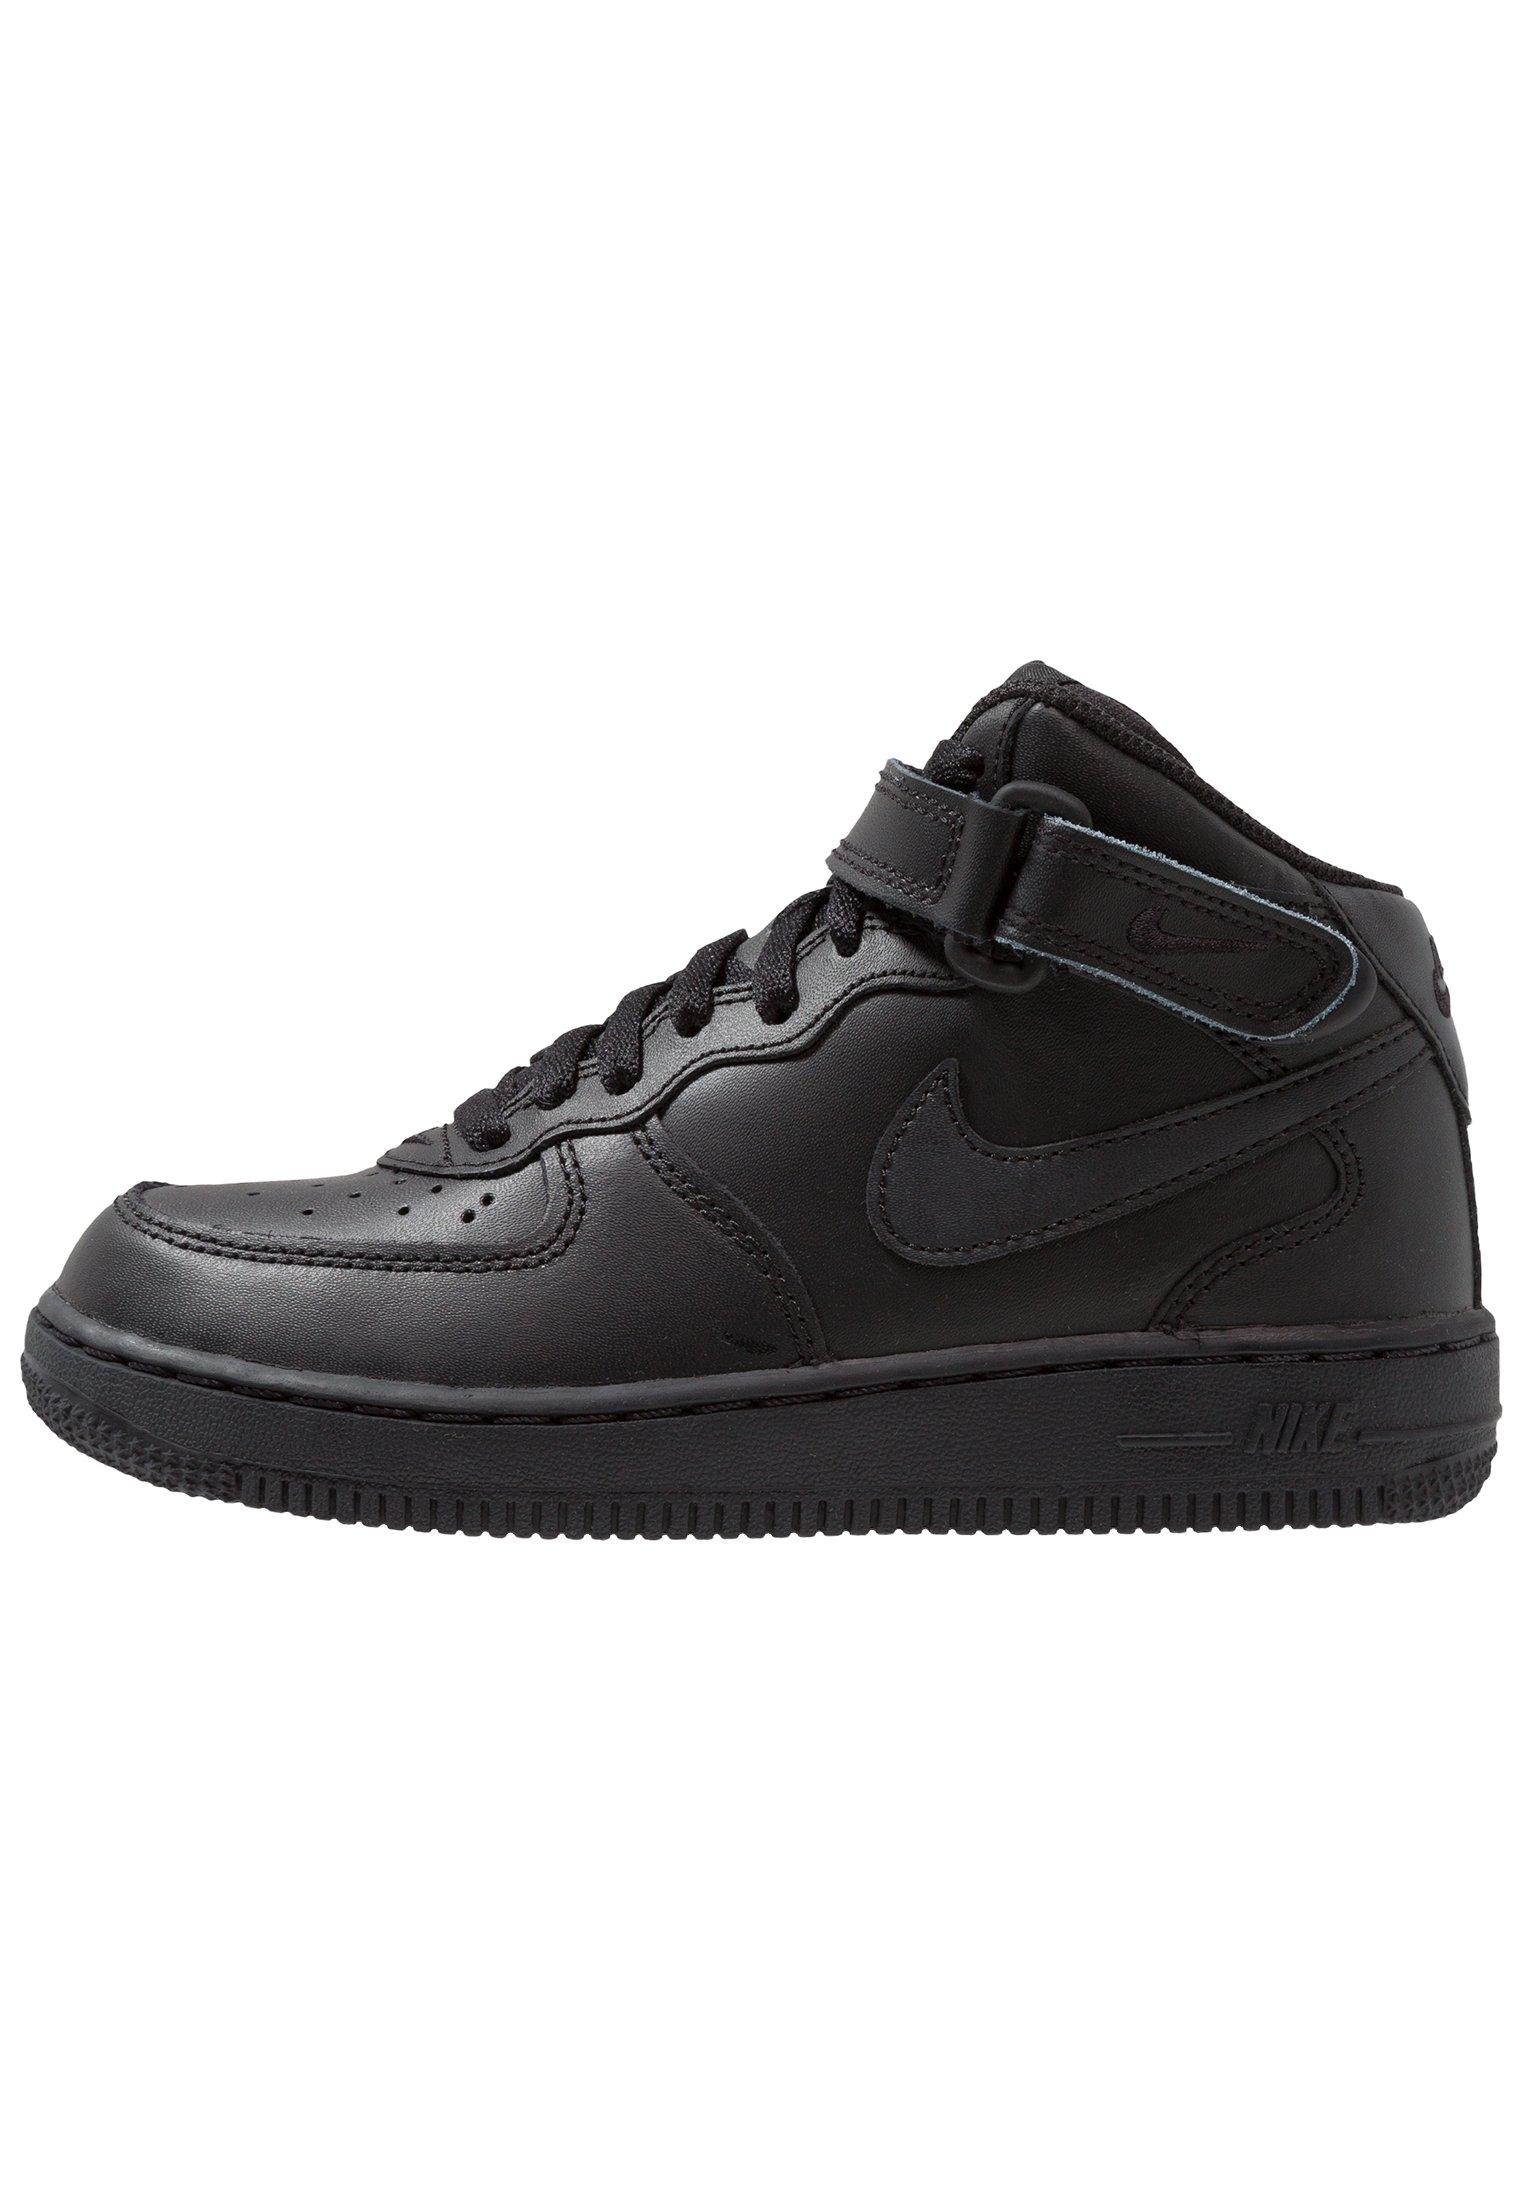 Nike Sportswear AIR FORCE 1 MID - Sneakers alte - black/nero ...